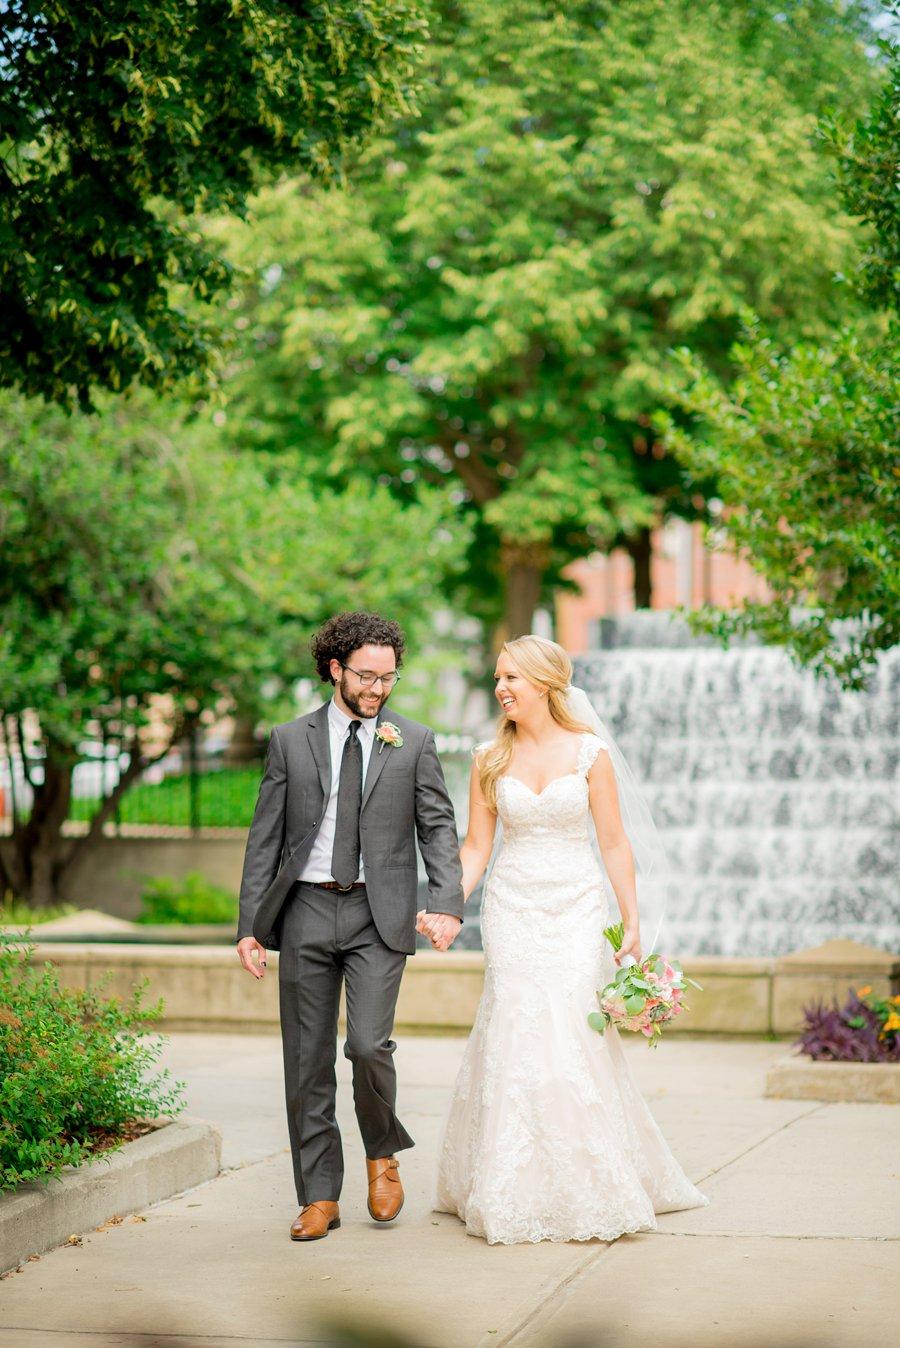 Teal & Peach Rustic Bee Inspired North Carolina Wedding via TheELD.com